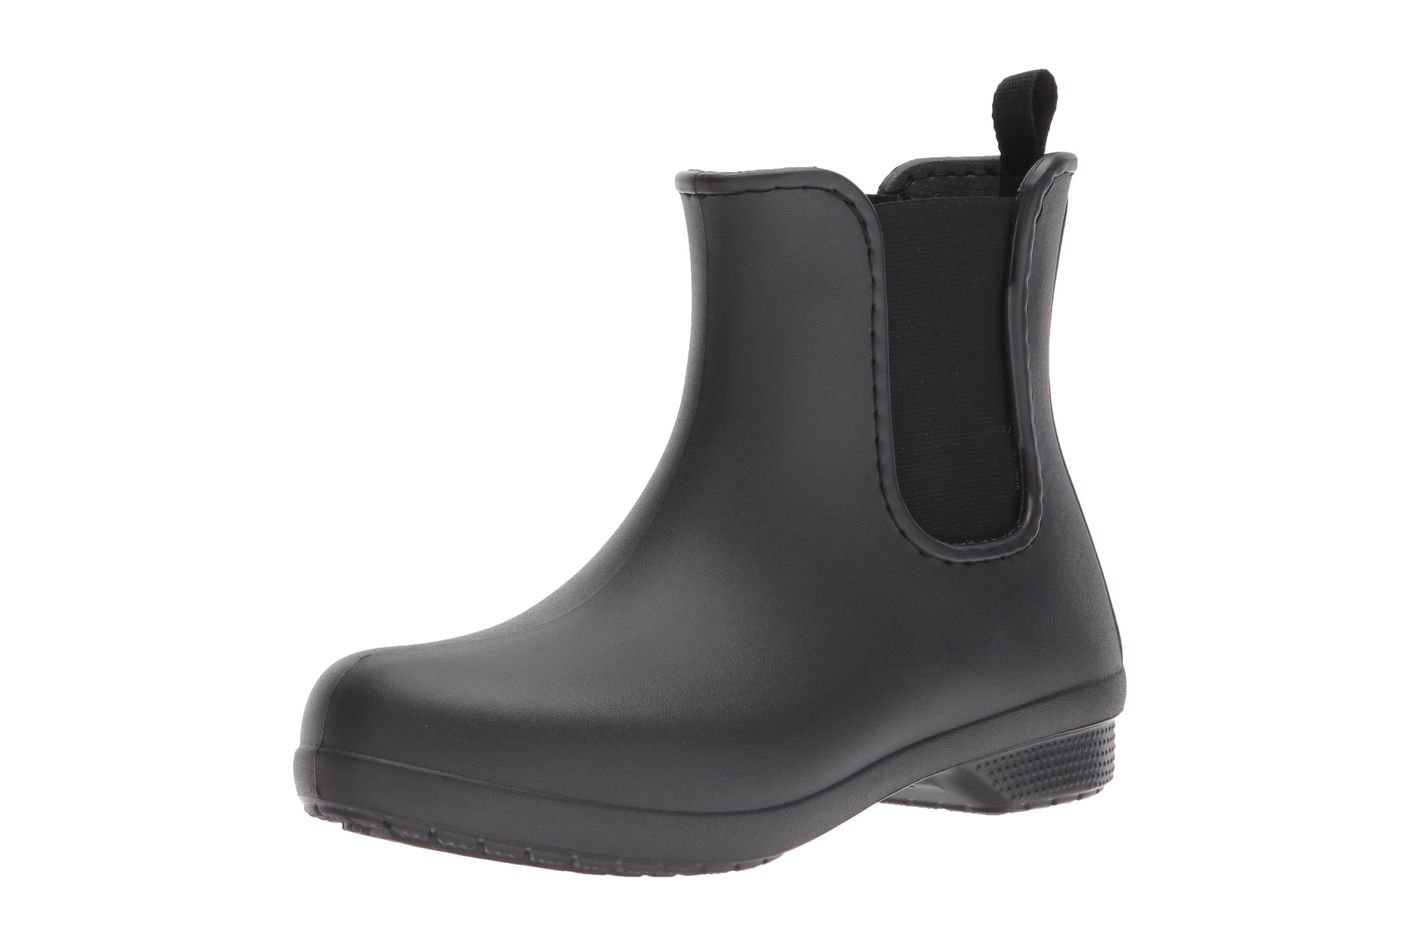 Crocs Women's Freesail Chelsea W Rain Boot